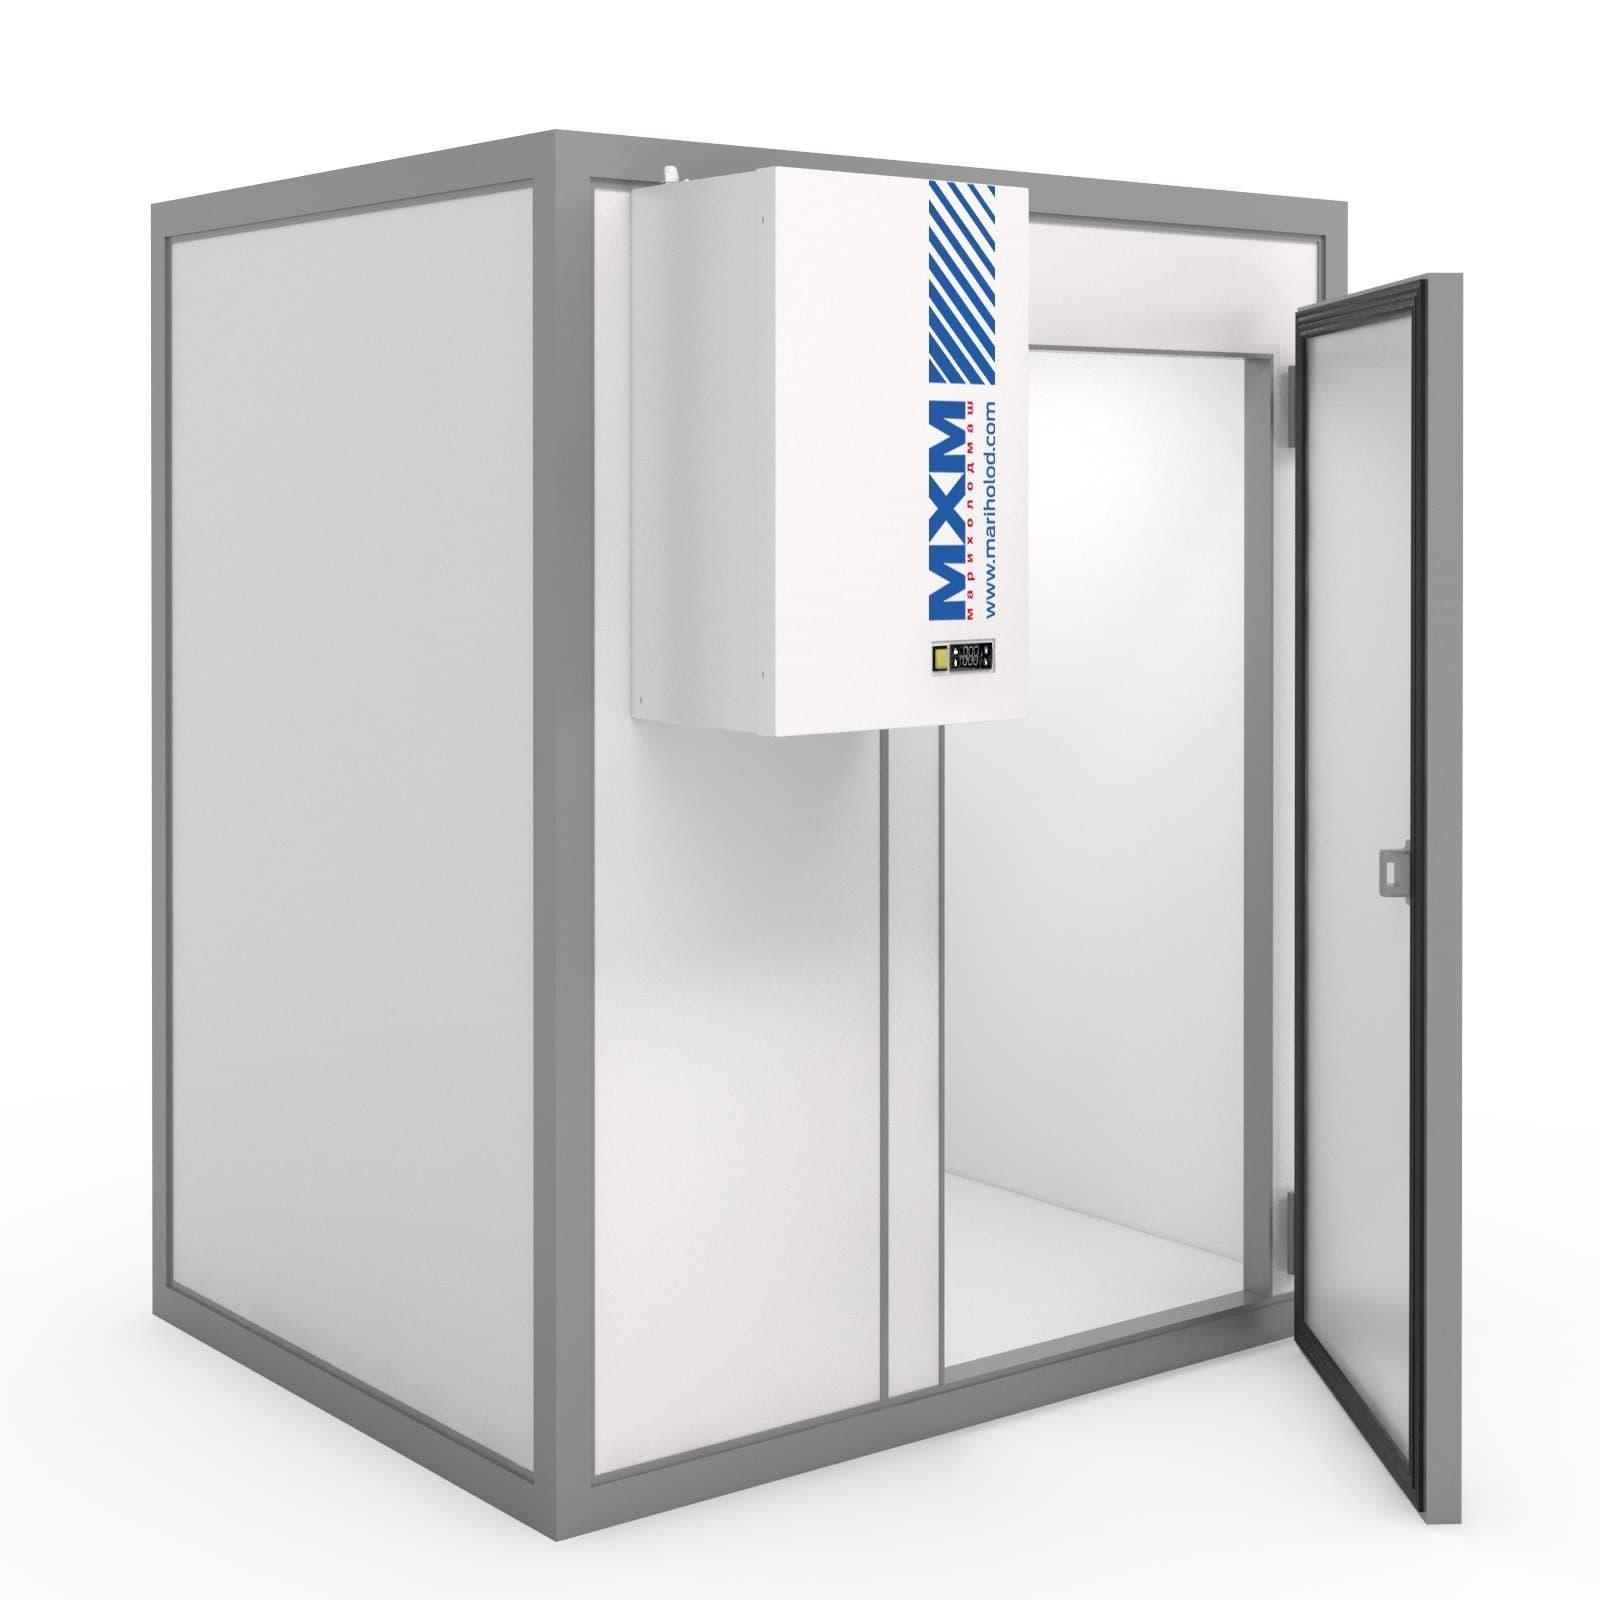 Камера холодильная МХМ КХН-20,28 1360×6760×2720